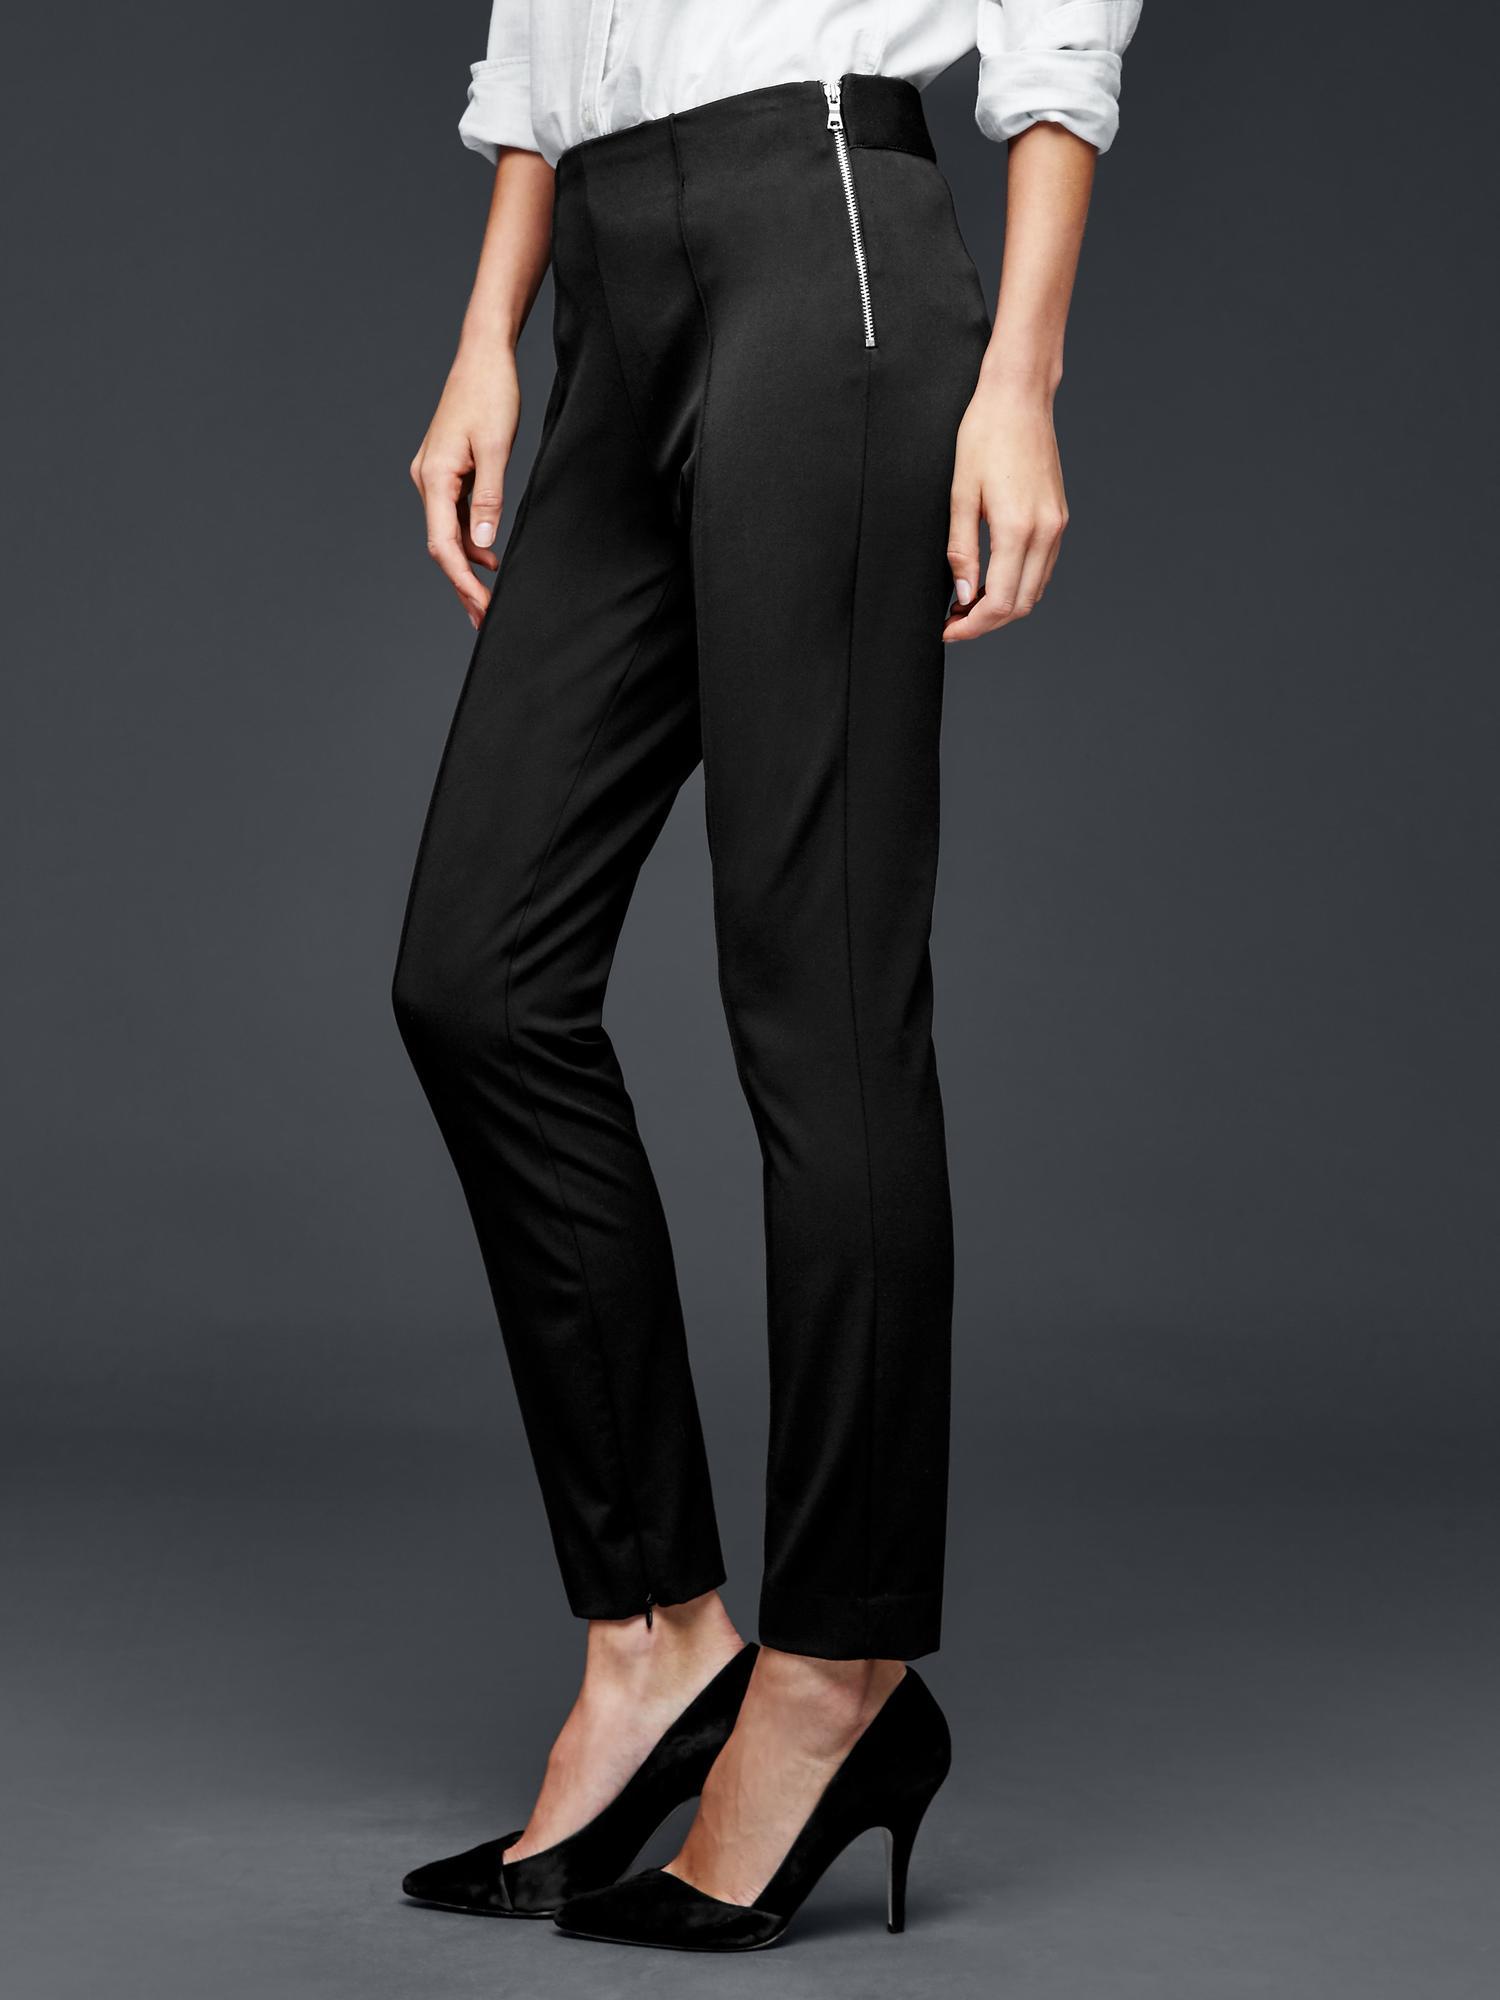 Gap Bi Stretch Side Zip Skinny Pants In Black True Black